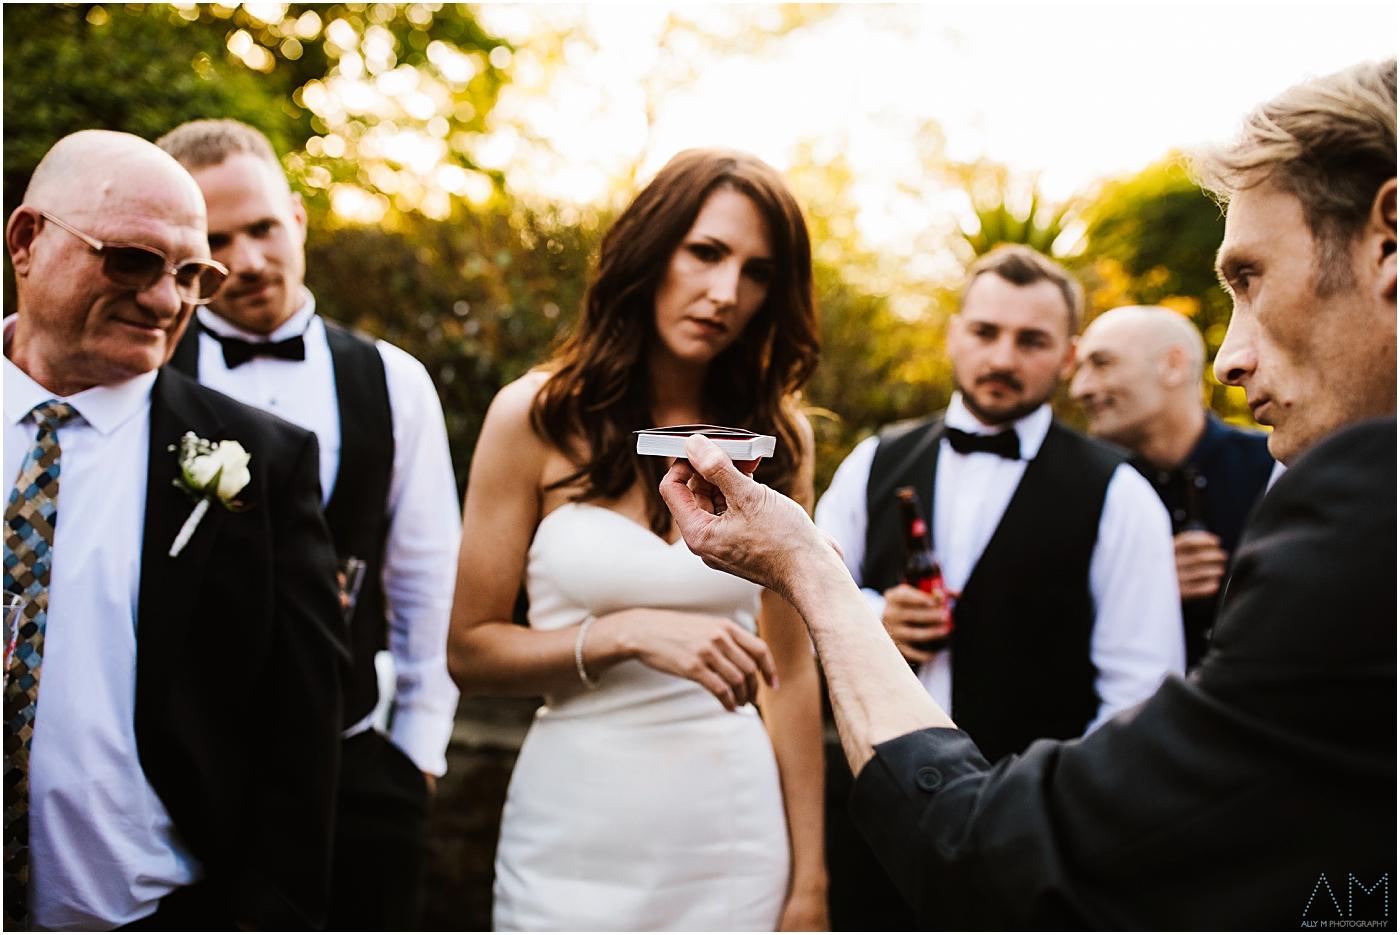 Magician showing bride a trick